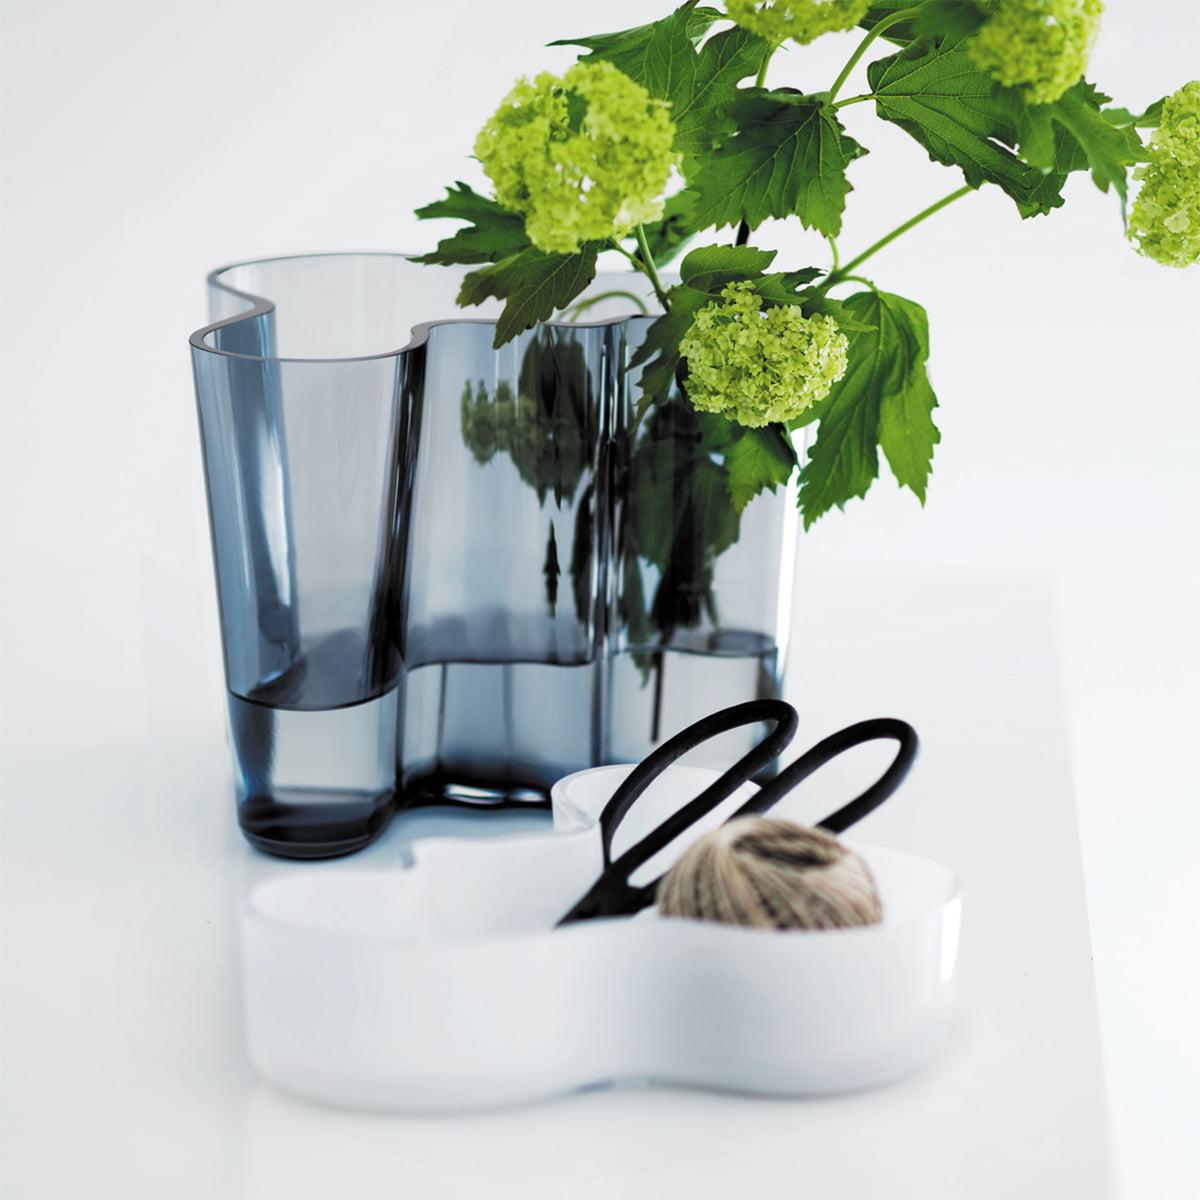 Aalto vase savoy 160 mm by iittala iittala aalto vase savoy 160 mm reviewsmspy